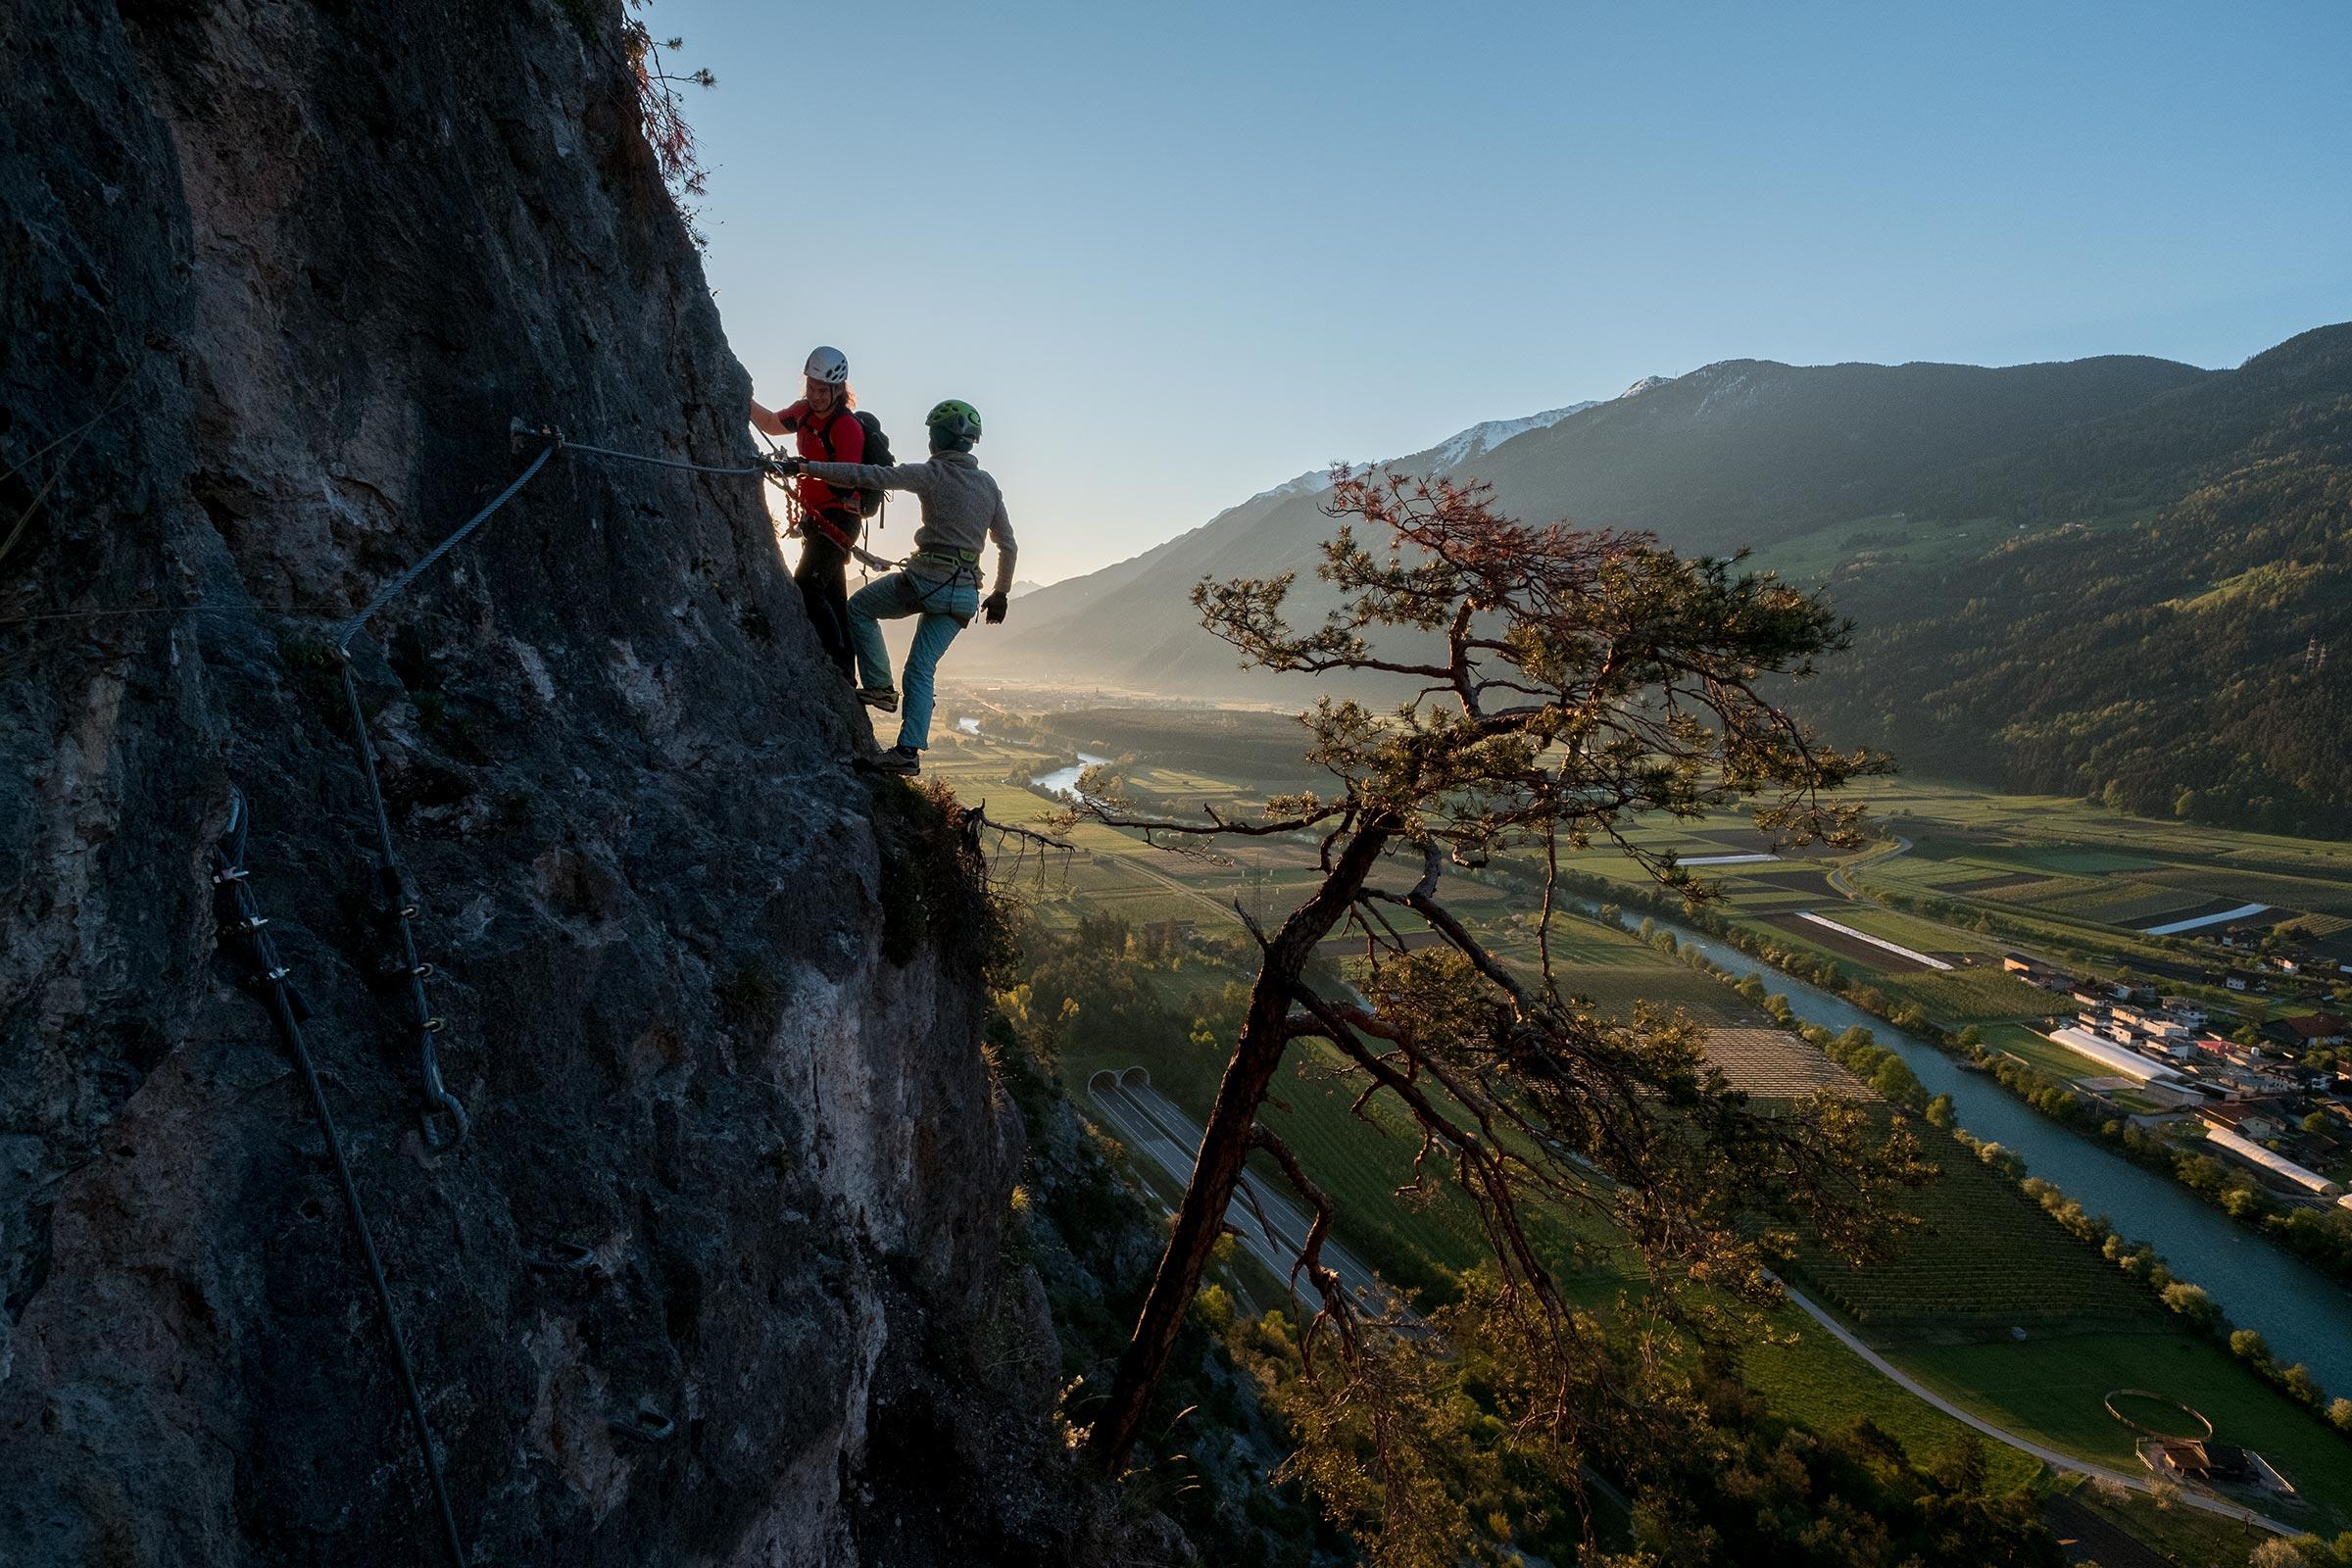 Klettersteig Geierwand - Ötztaler Mountainbike Festival